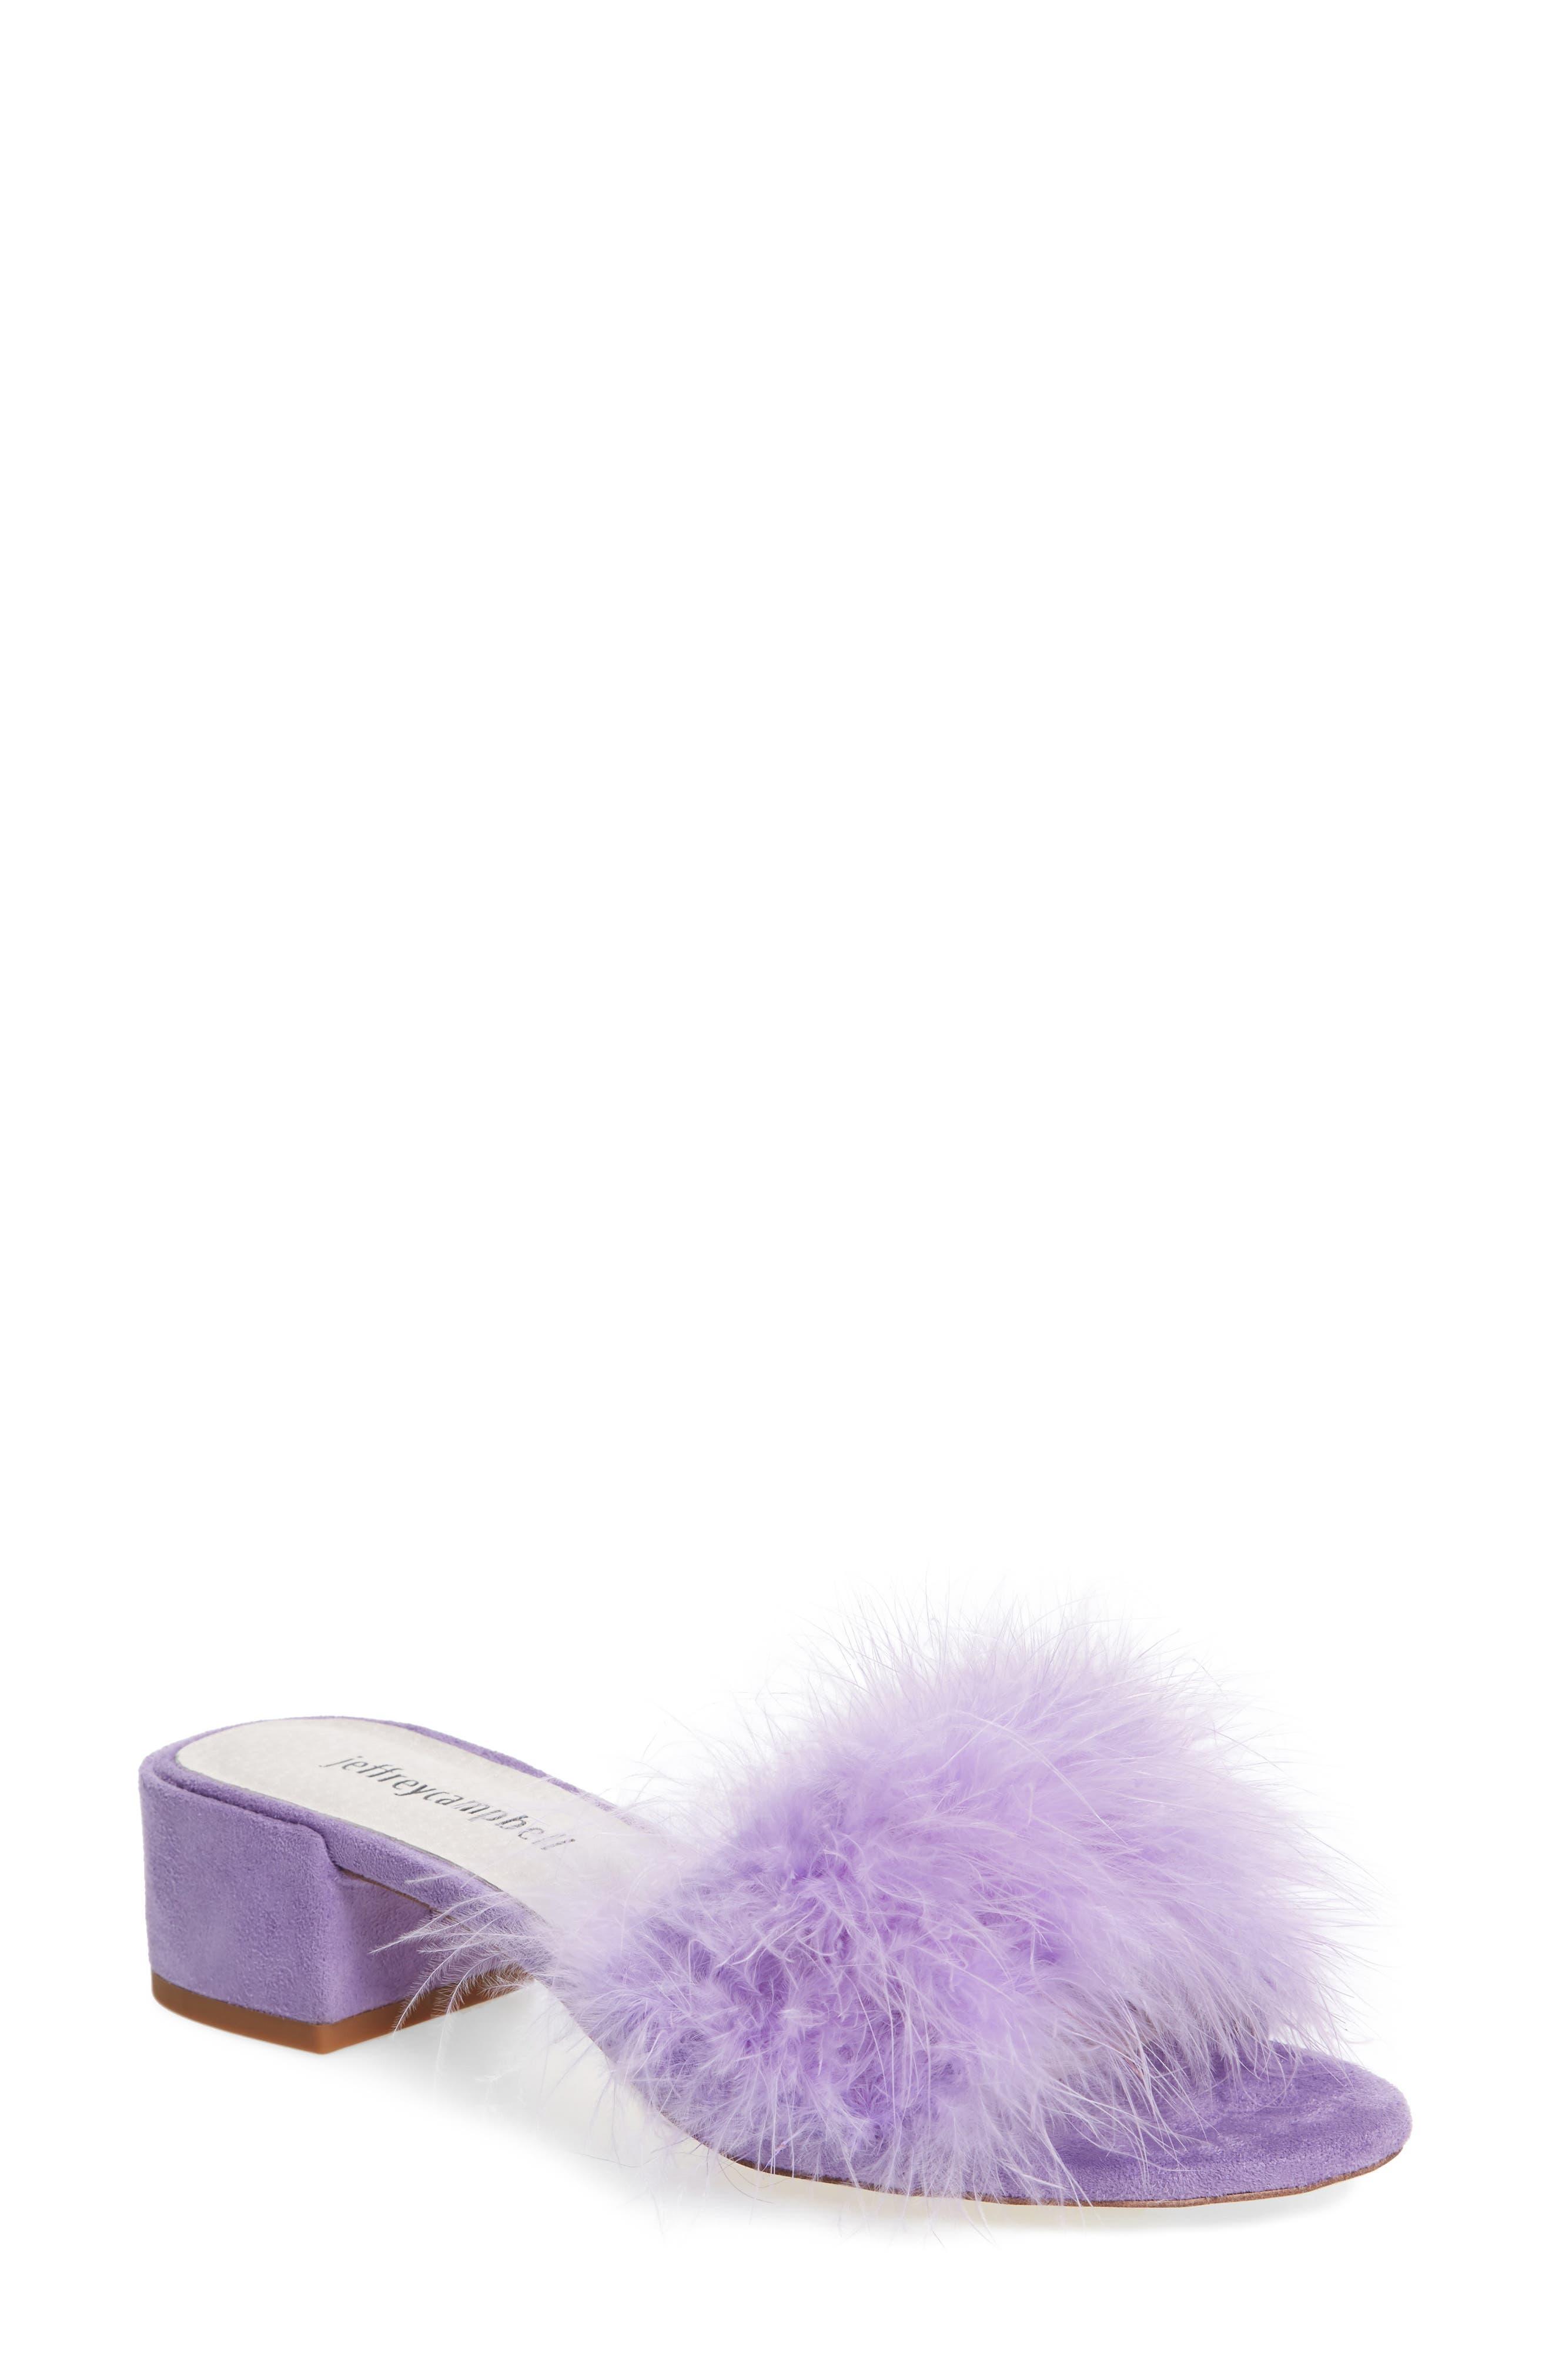 Main Image - Jeffrey Campbell 'Beaton' Slide Sandal (Women)